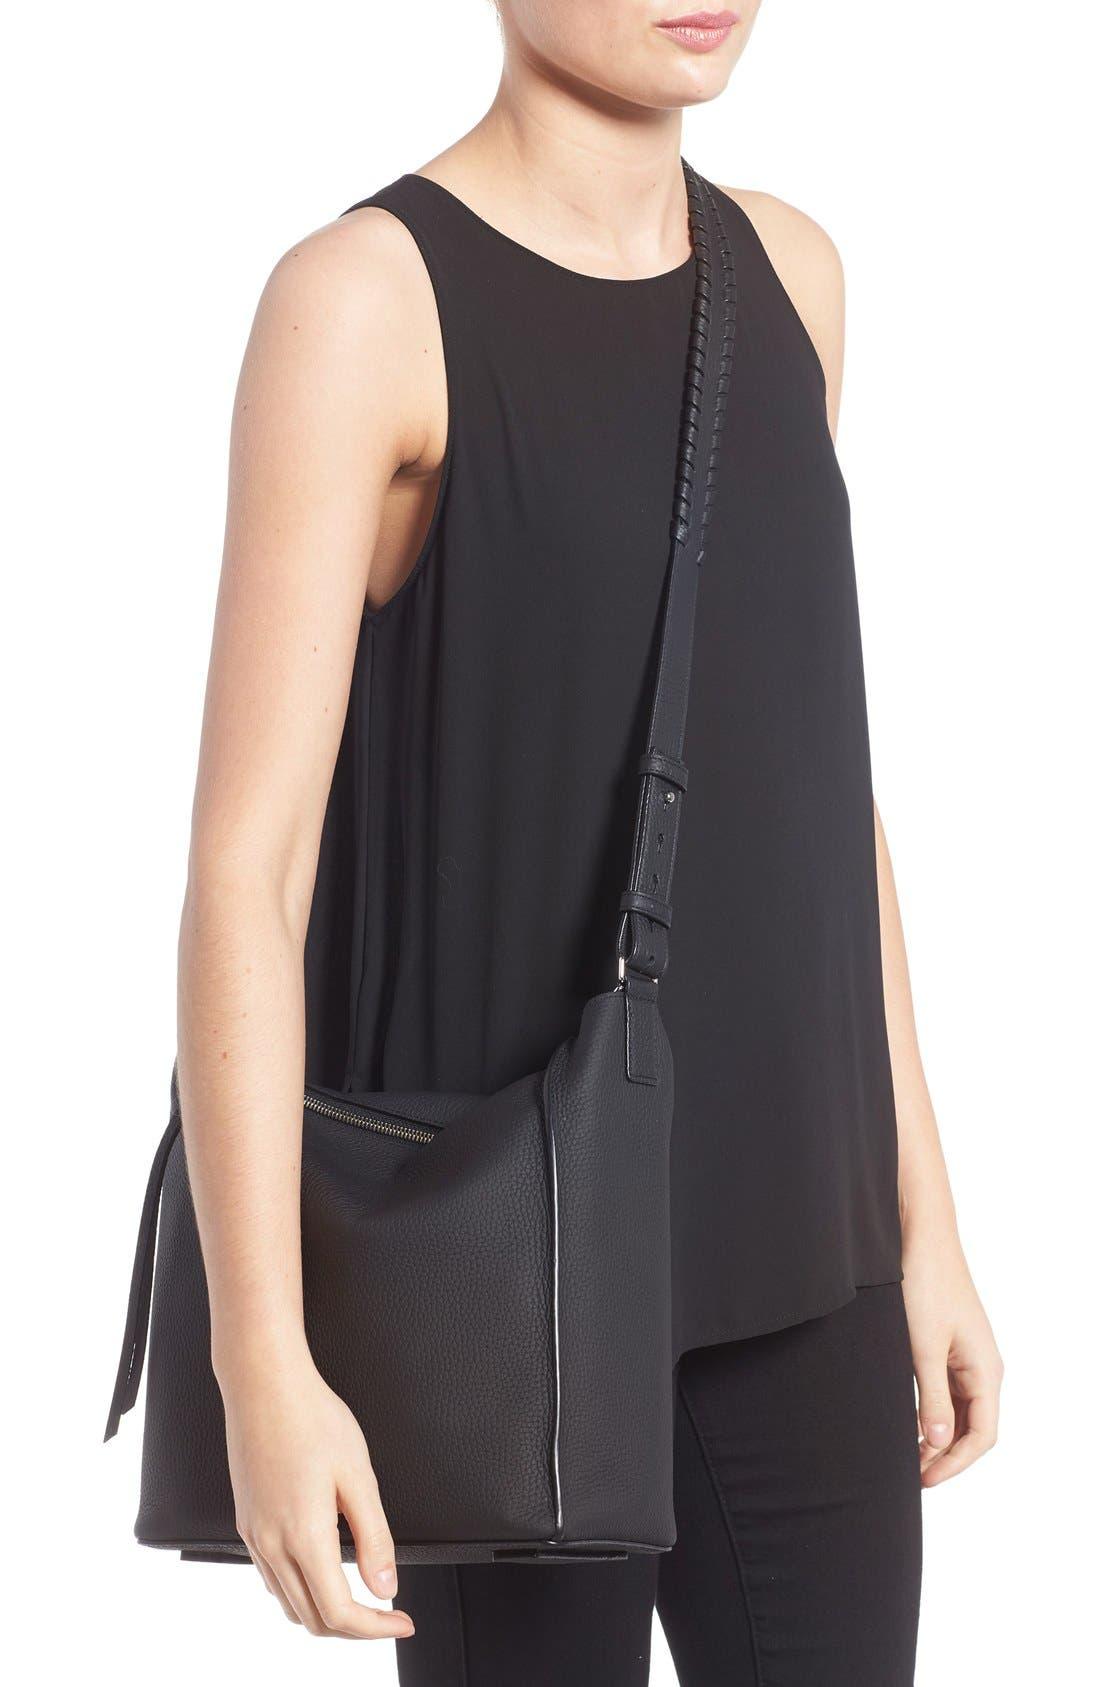 'Kita' Leather Shoulder/Crossbody Bag,                             Alternate thumbnail 2, color,                             BLACK